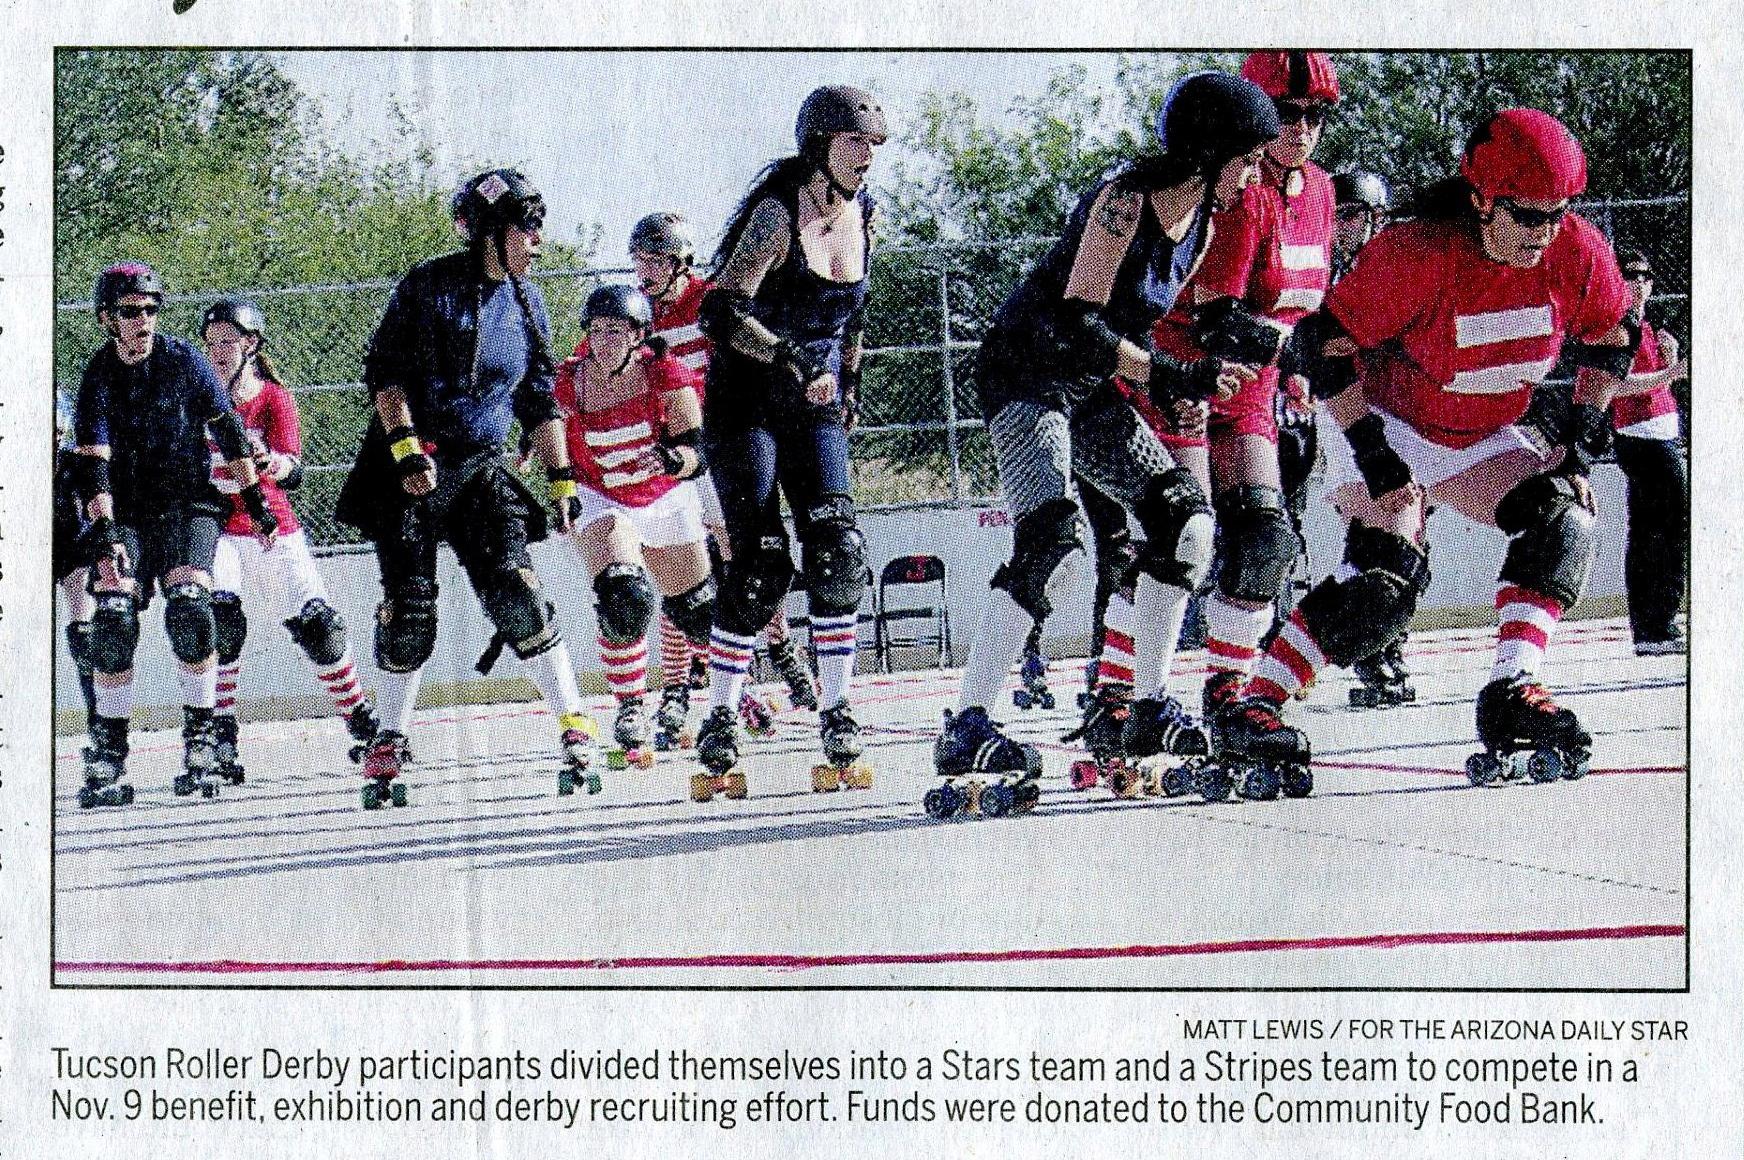 Roller derby women honor veterans - Arizona Daily Star